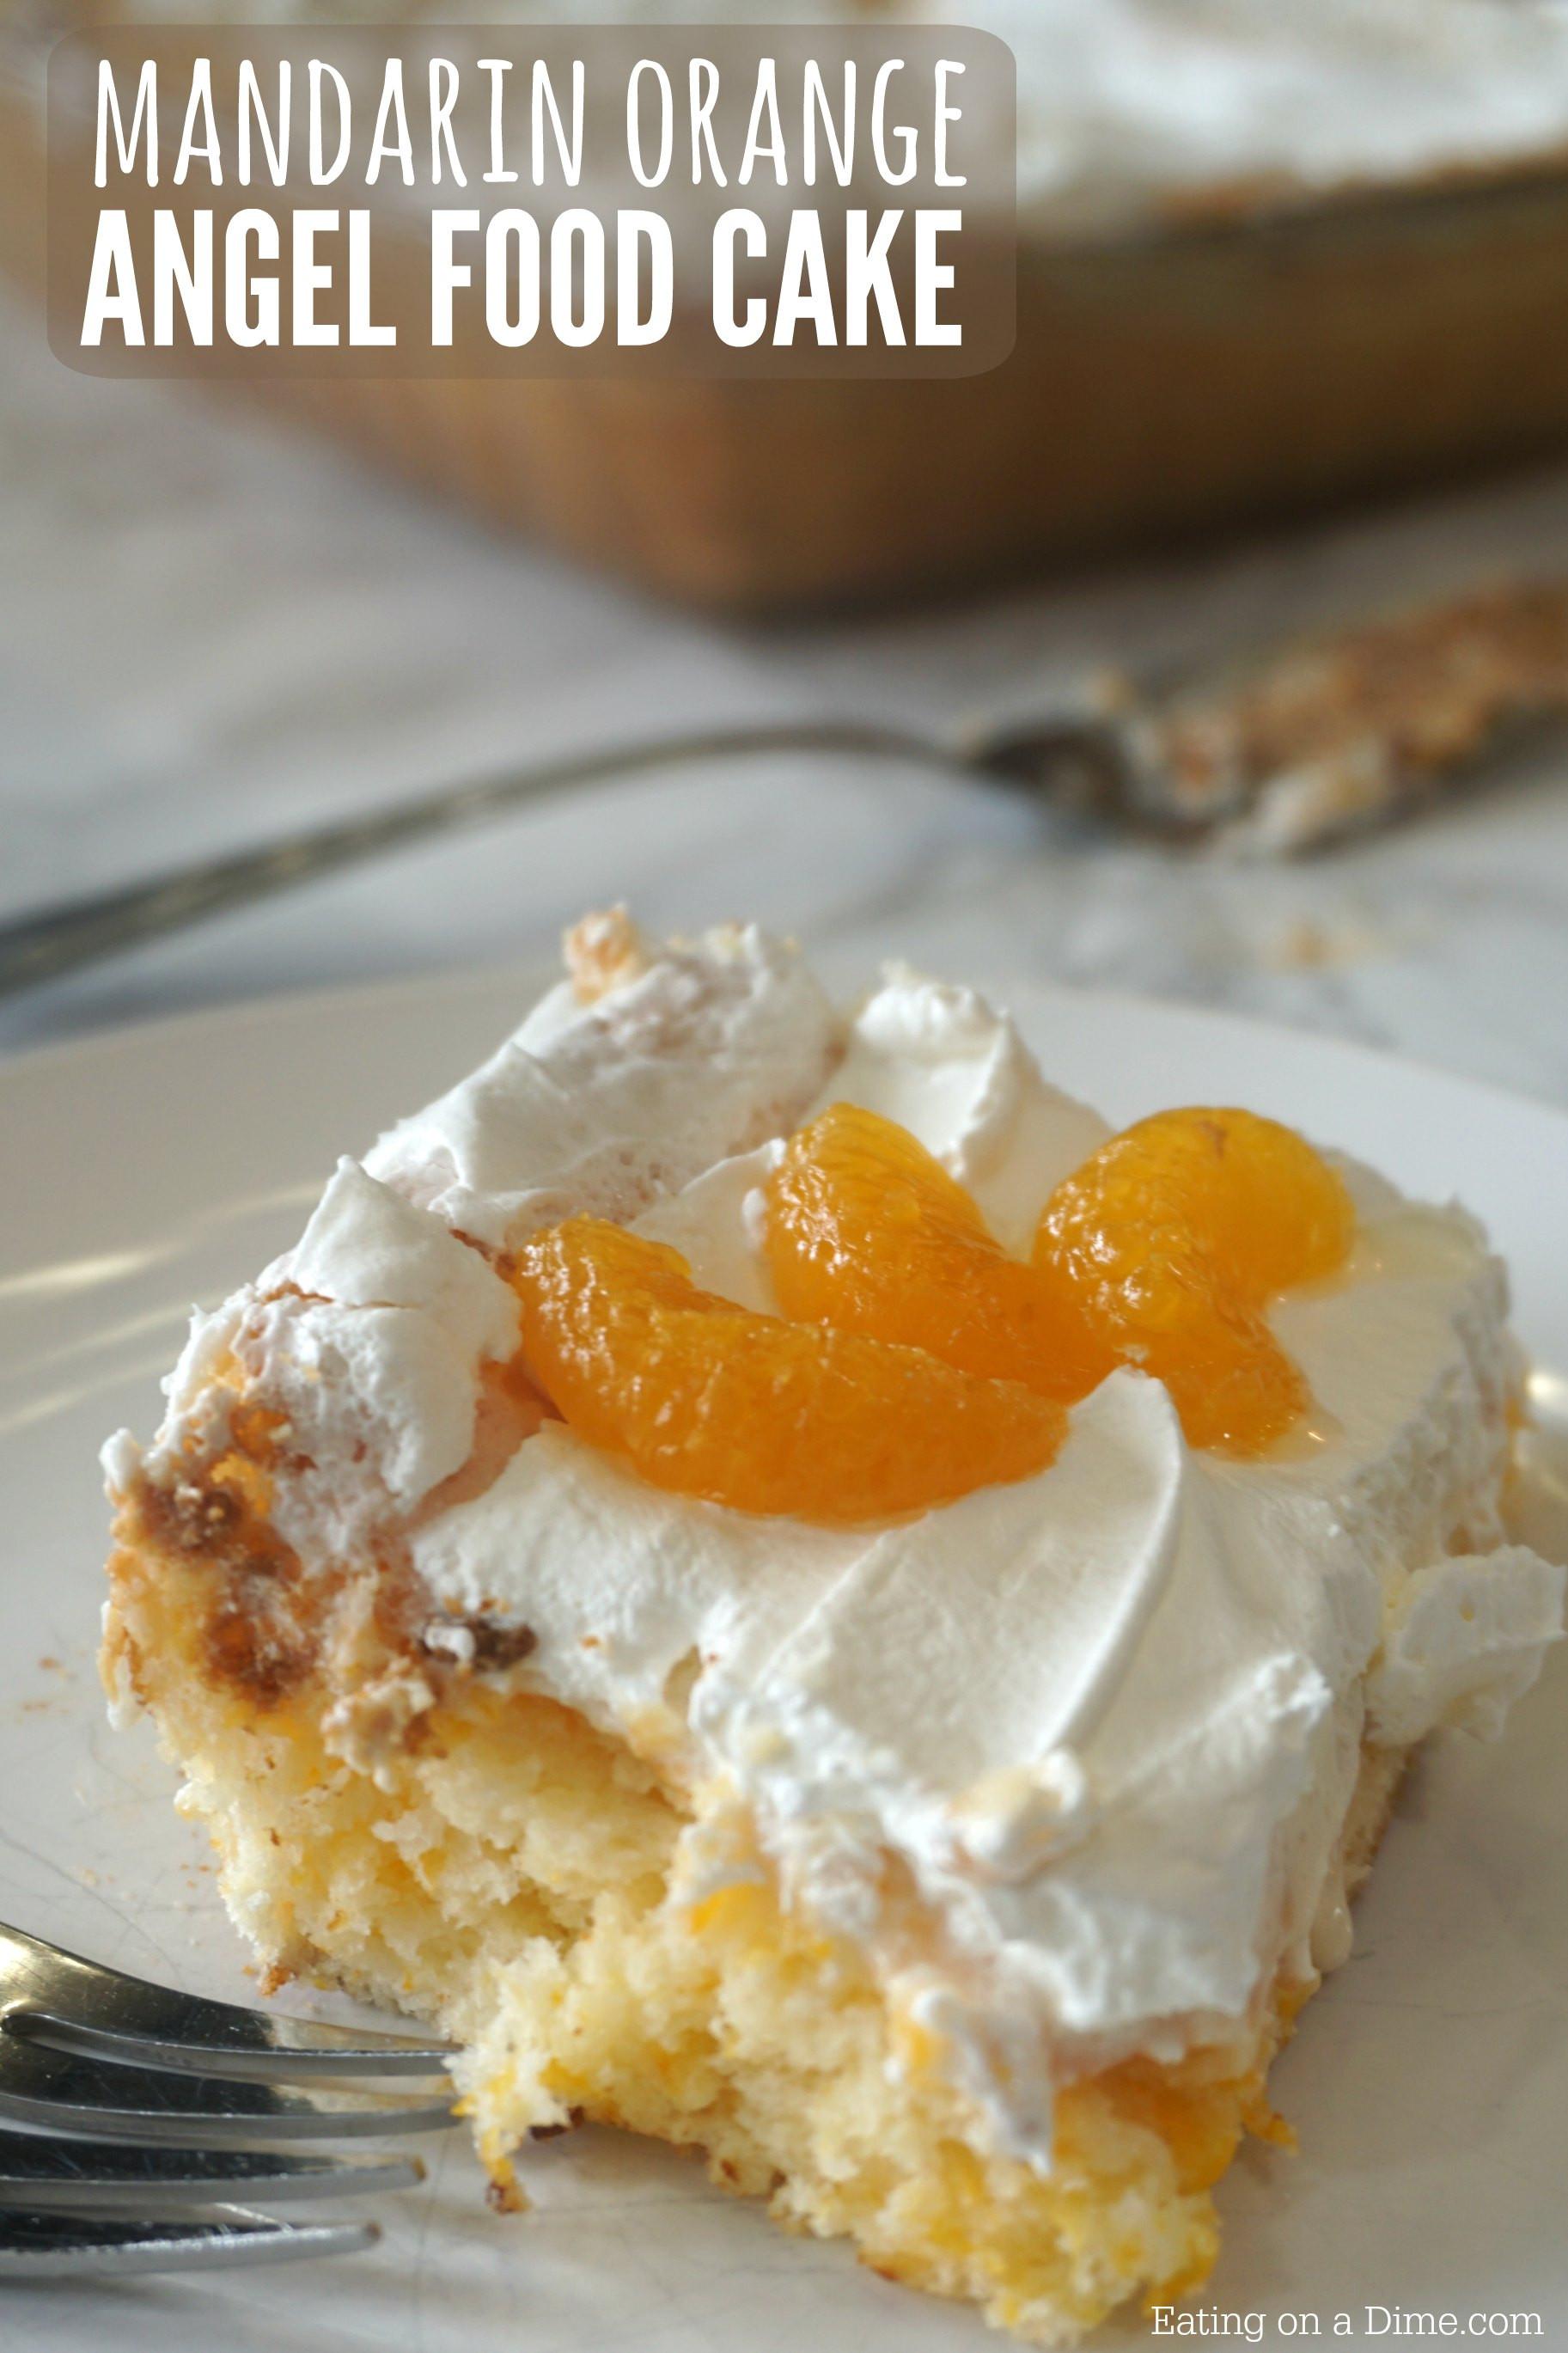 Easy Angel Food Cake Recipe  mandarin orange angel food cake recipe Easy Angel Food